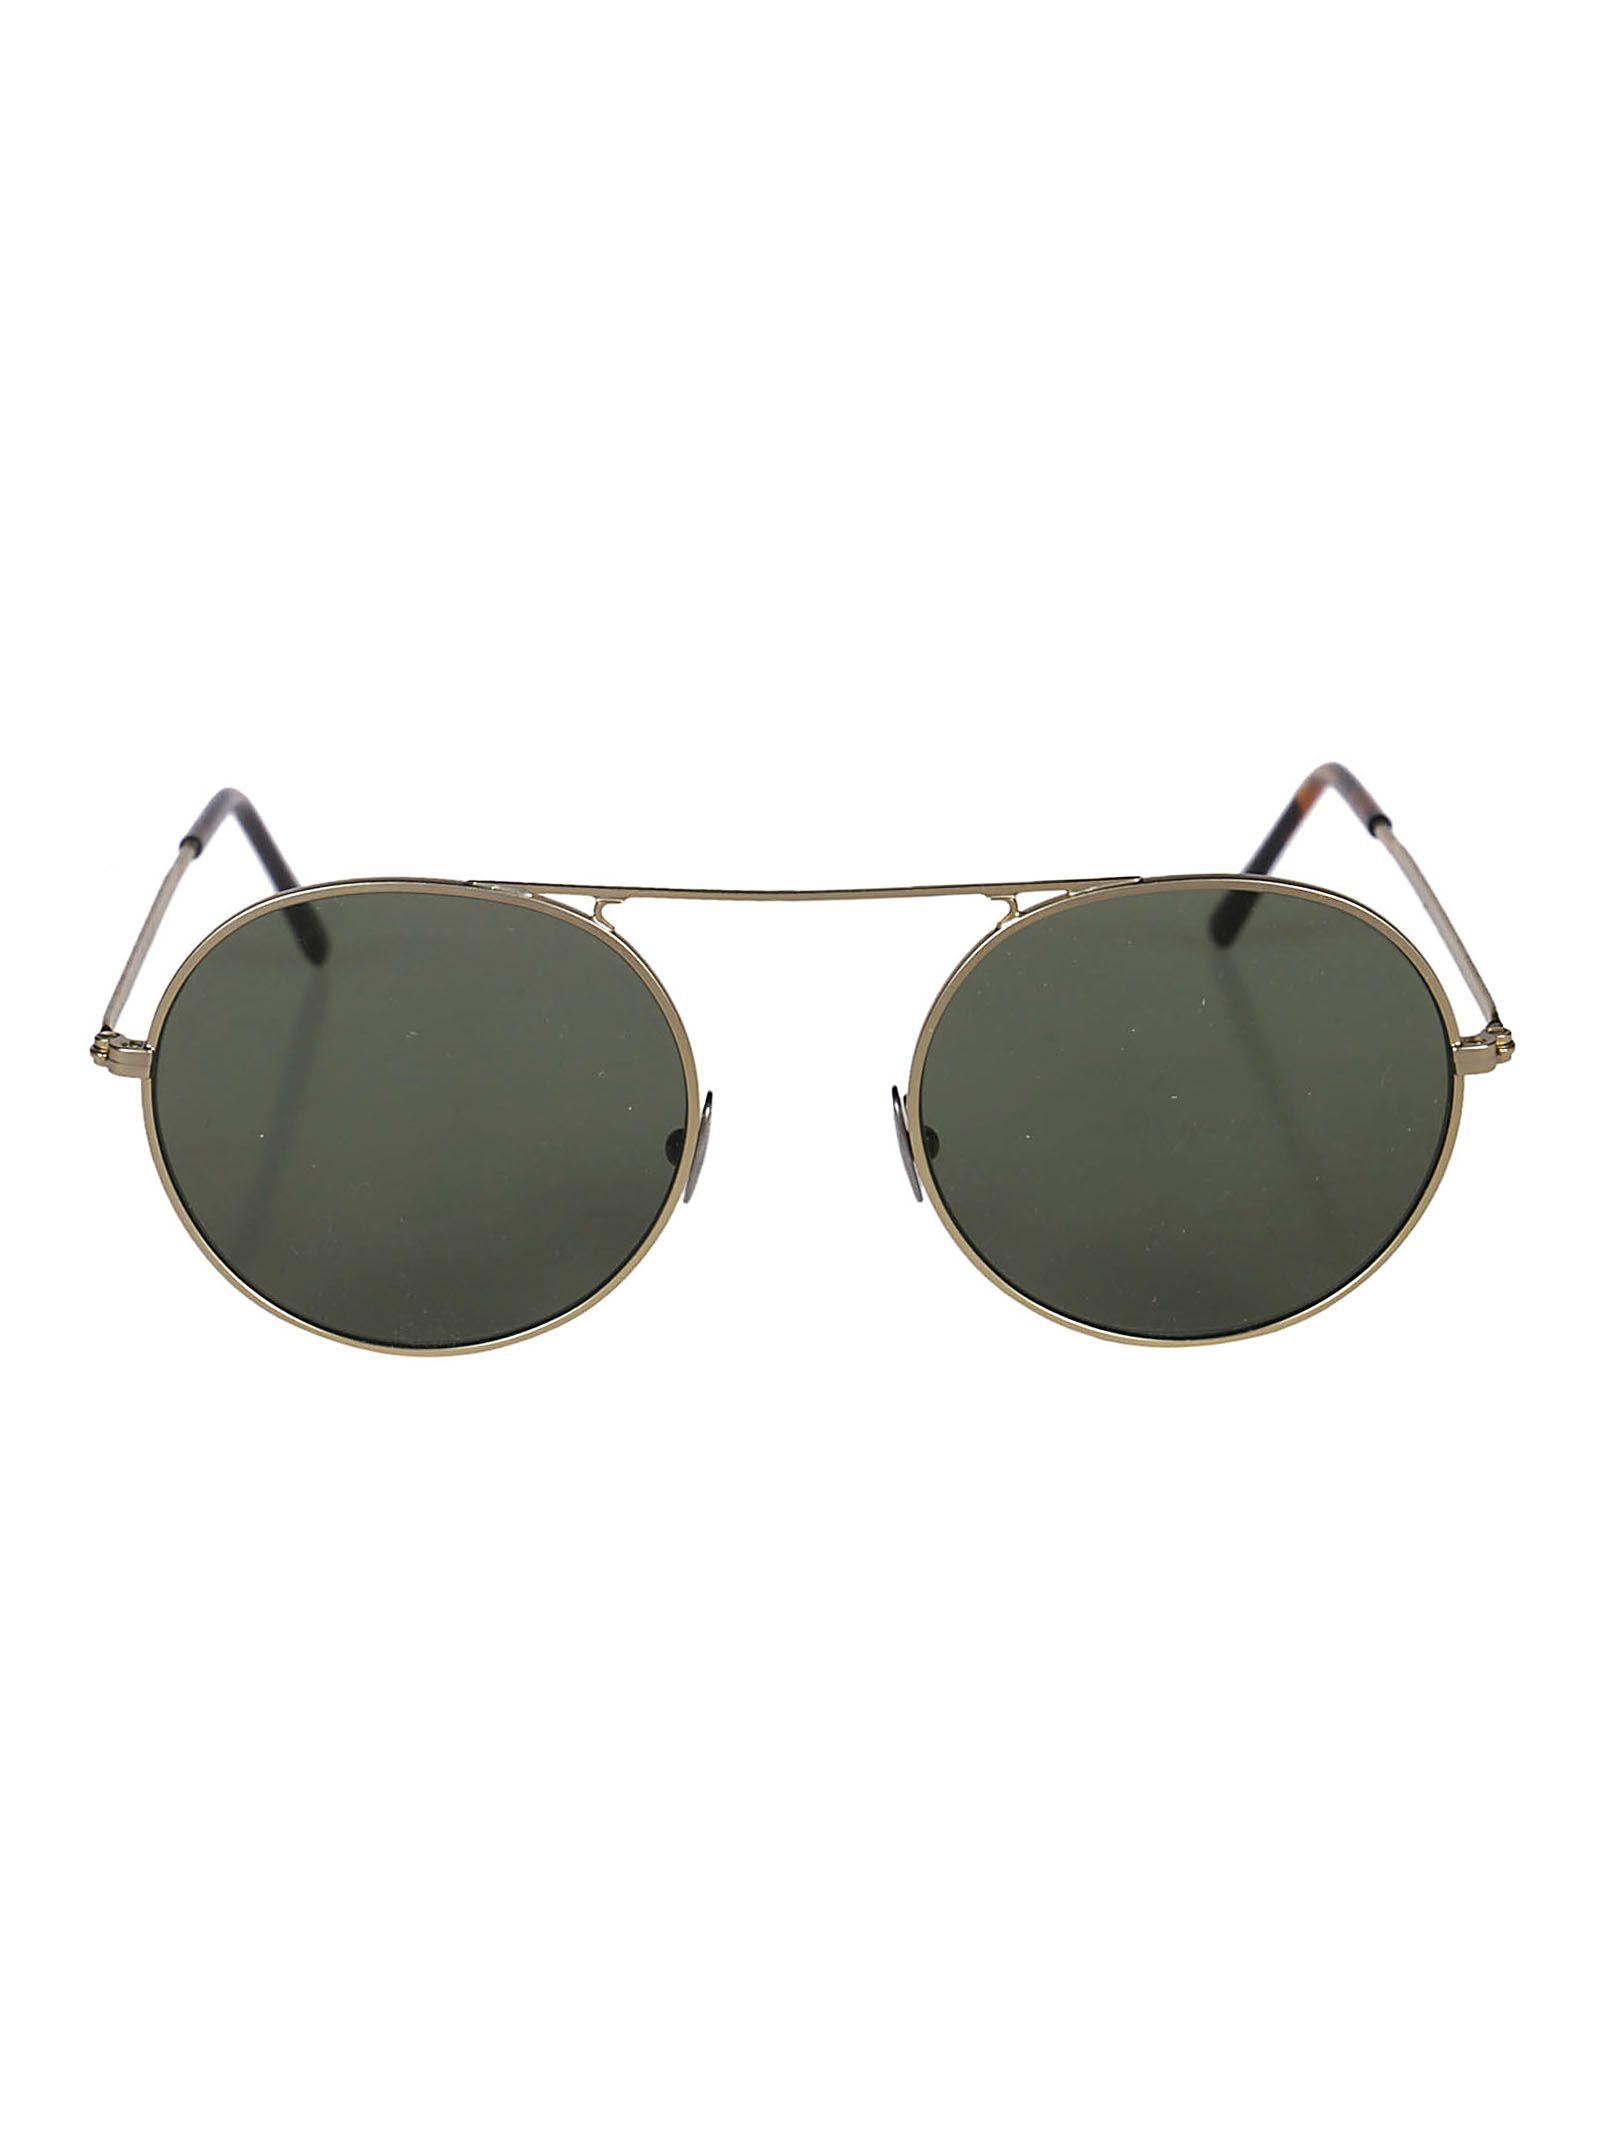 L.G.R Lgr Round Sunglasses in Gold Matt